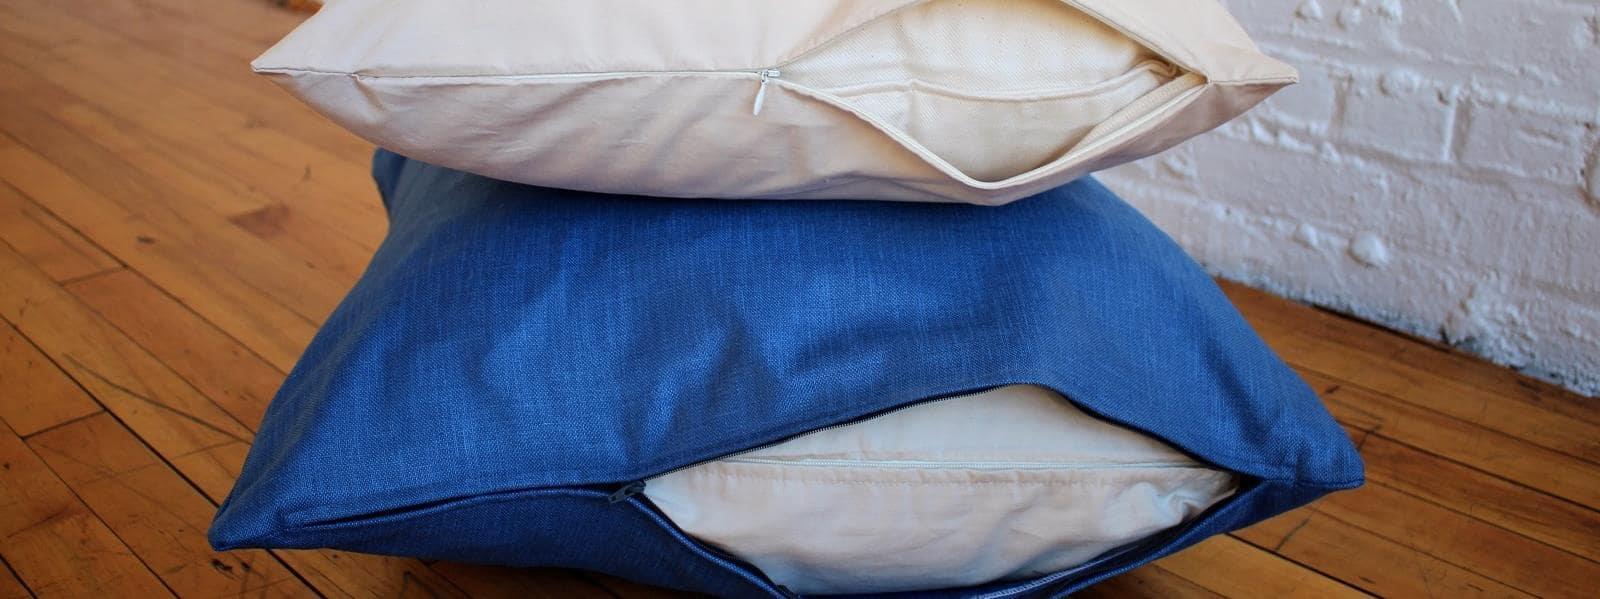 Natural & Organic Covers for Pillows, Futons & Mat